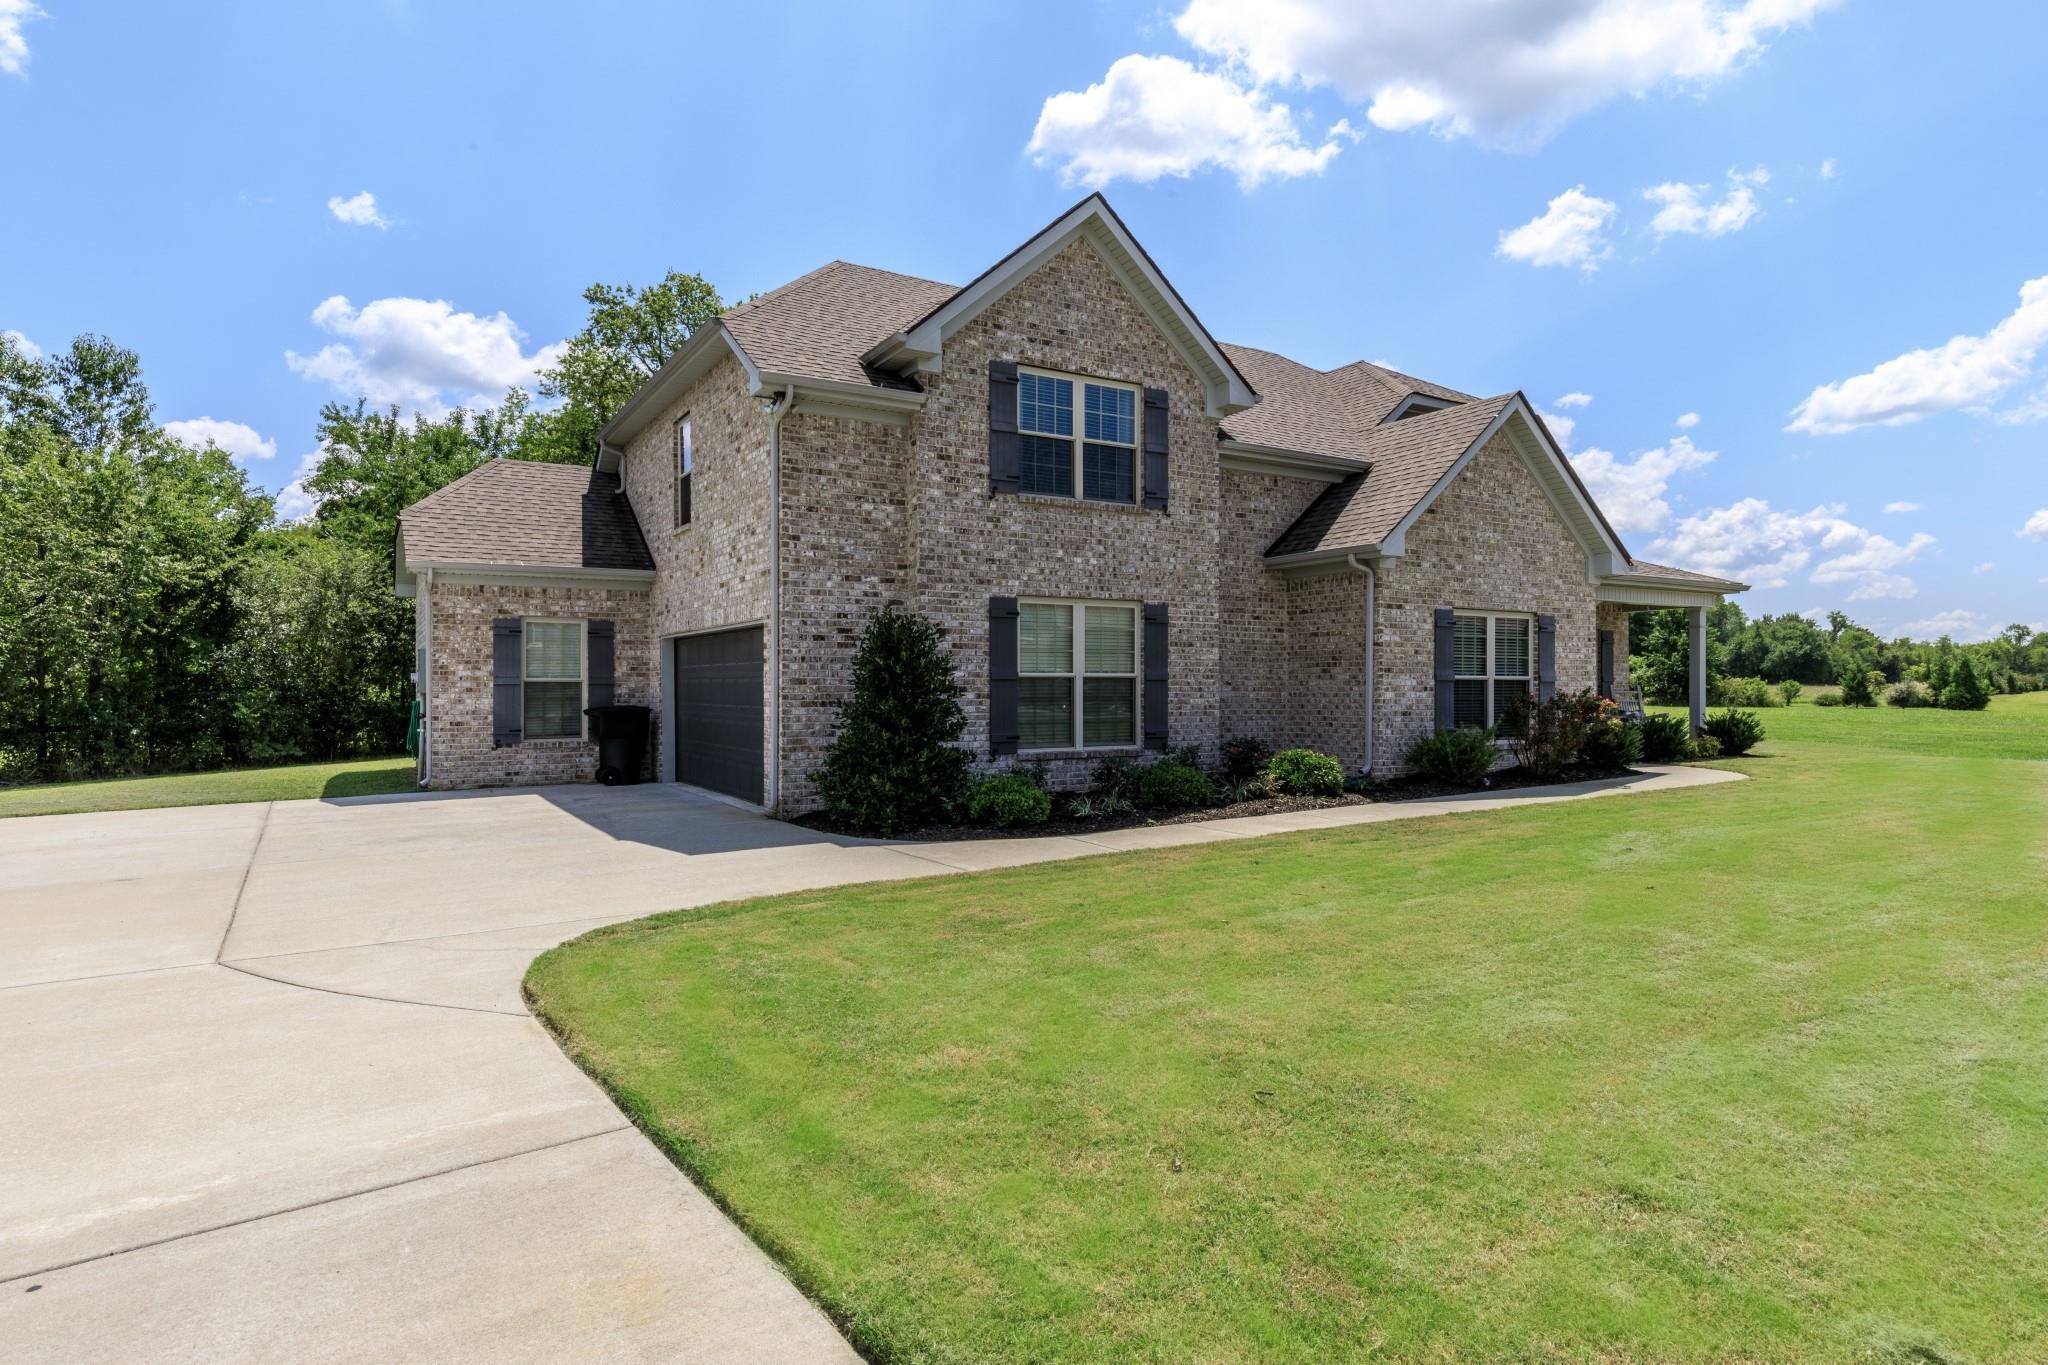 2004 Chapel Ct, Murfreesboro, TN 37128 - Murfreesboro, TN real estate listing